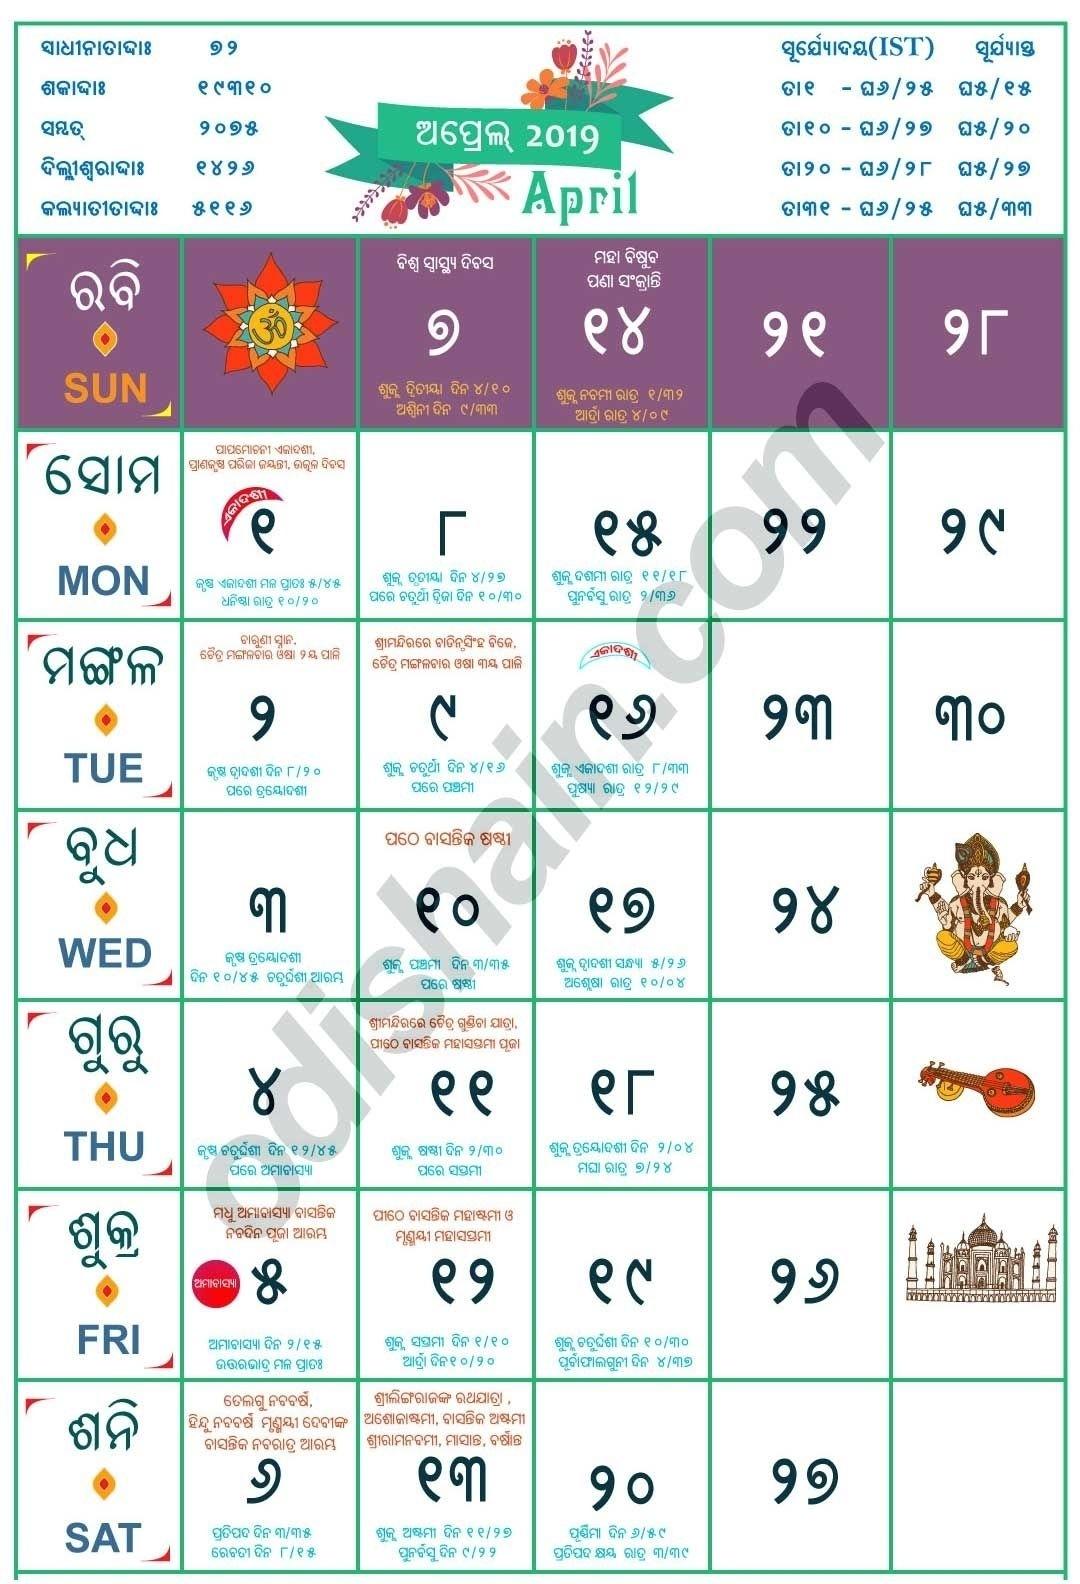 20+ Calendar 2021 Odia - Free Download Printable Calendar Templates ️ October 2021 Calendar With Holidays Philippines